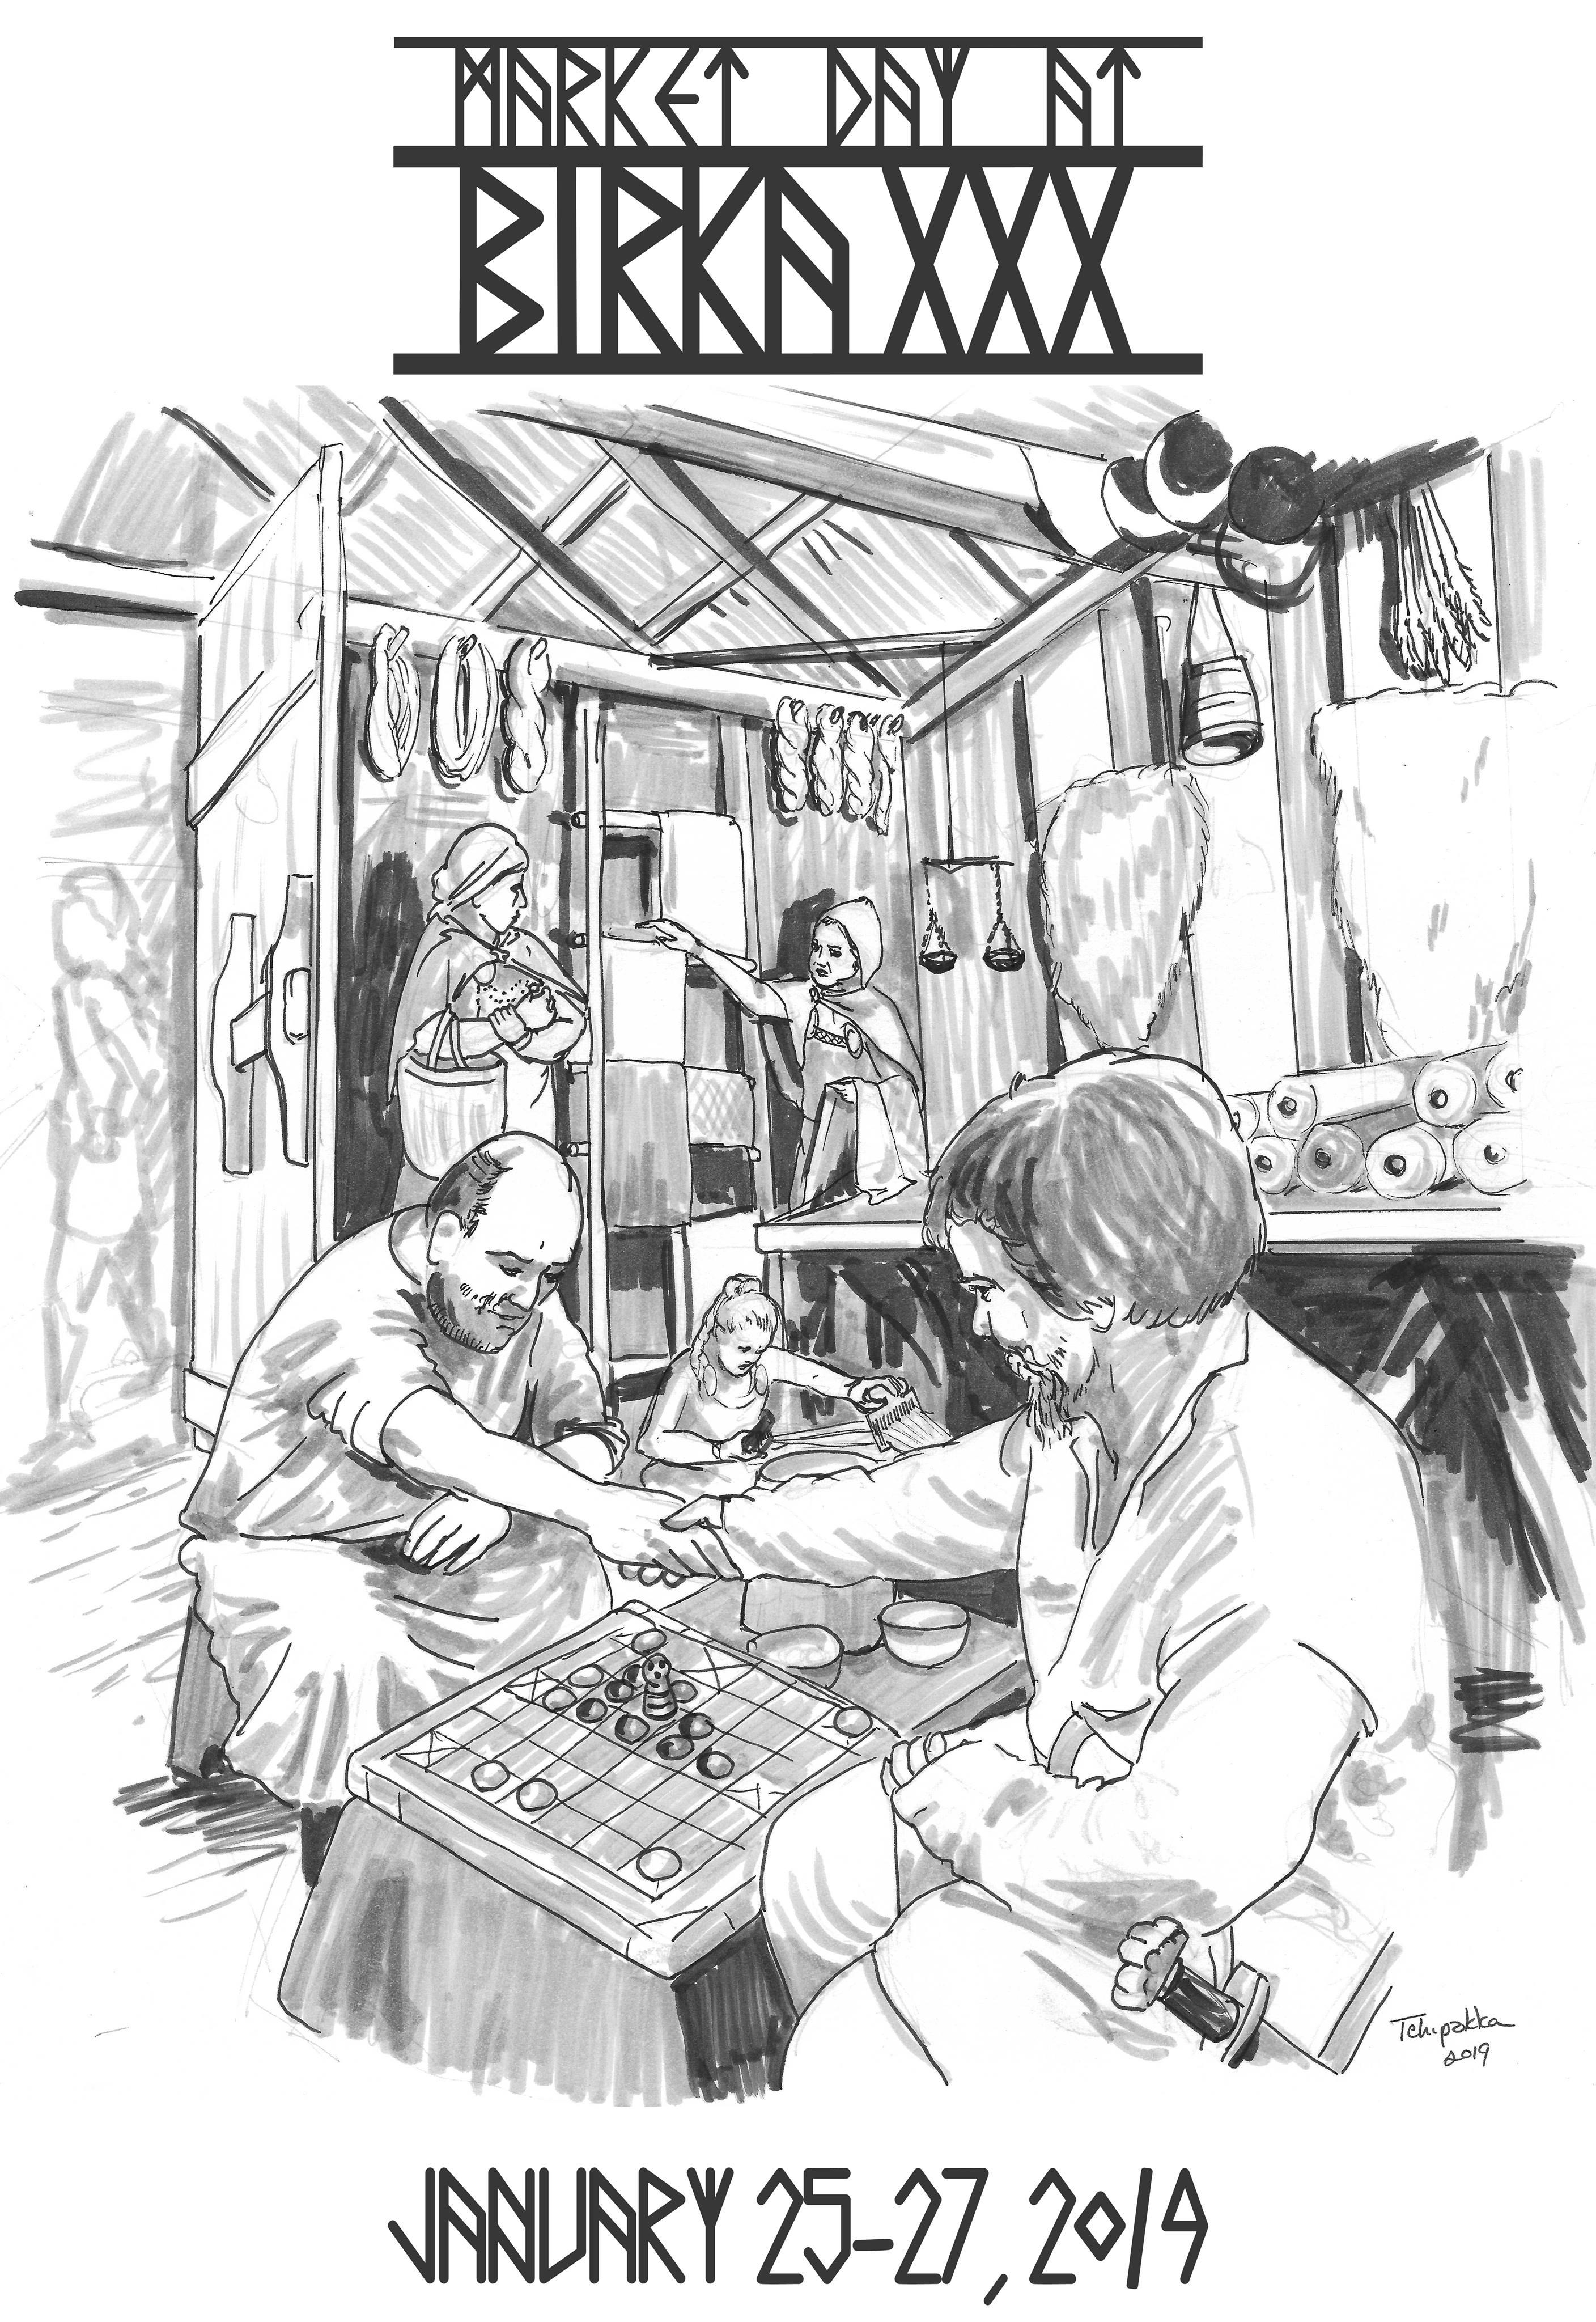 Event site book cover illustration